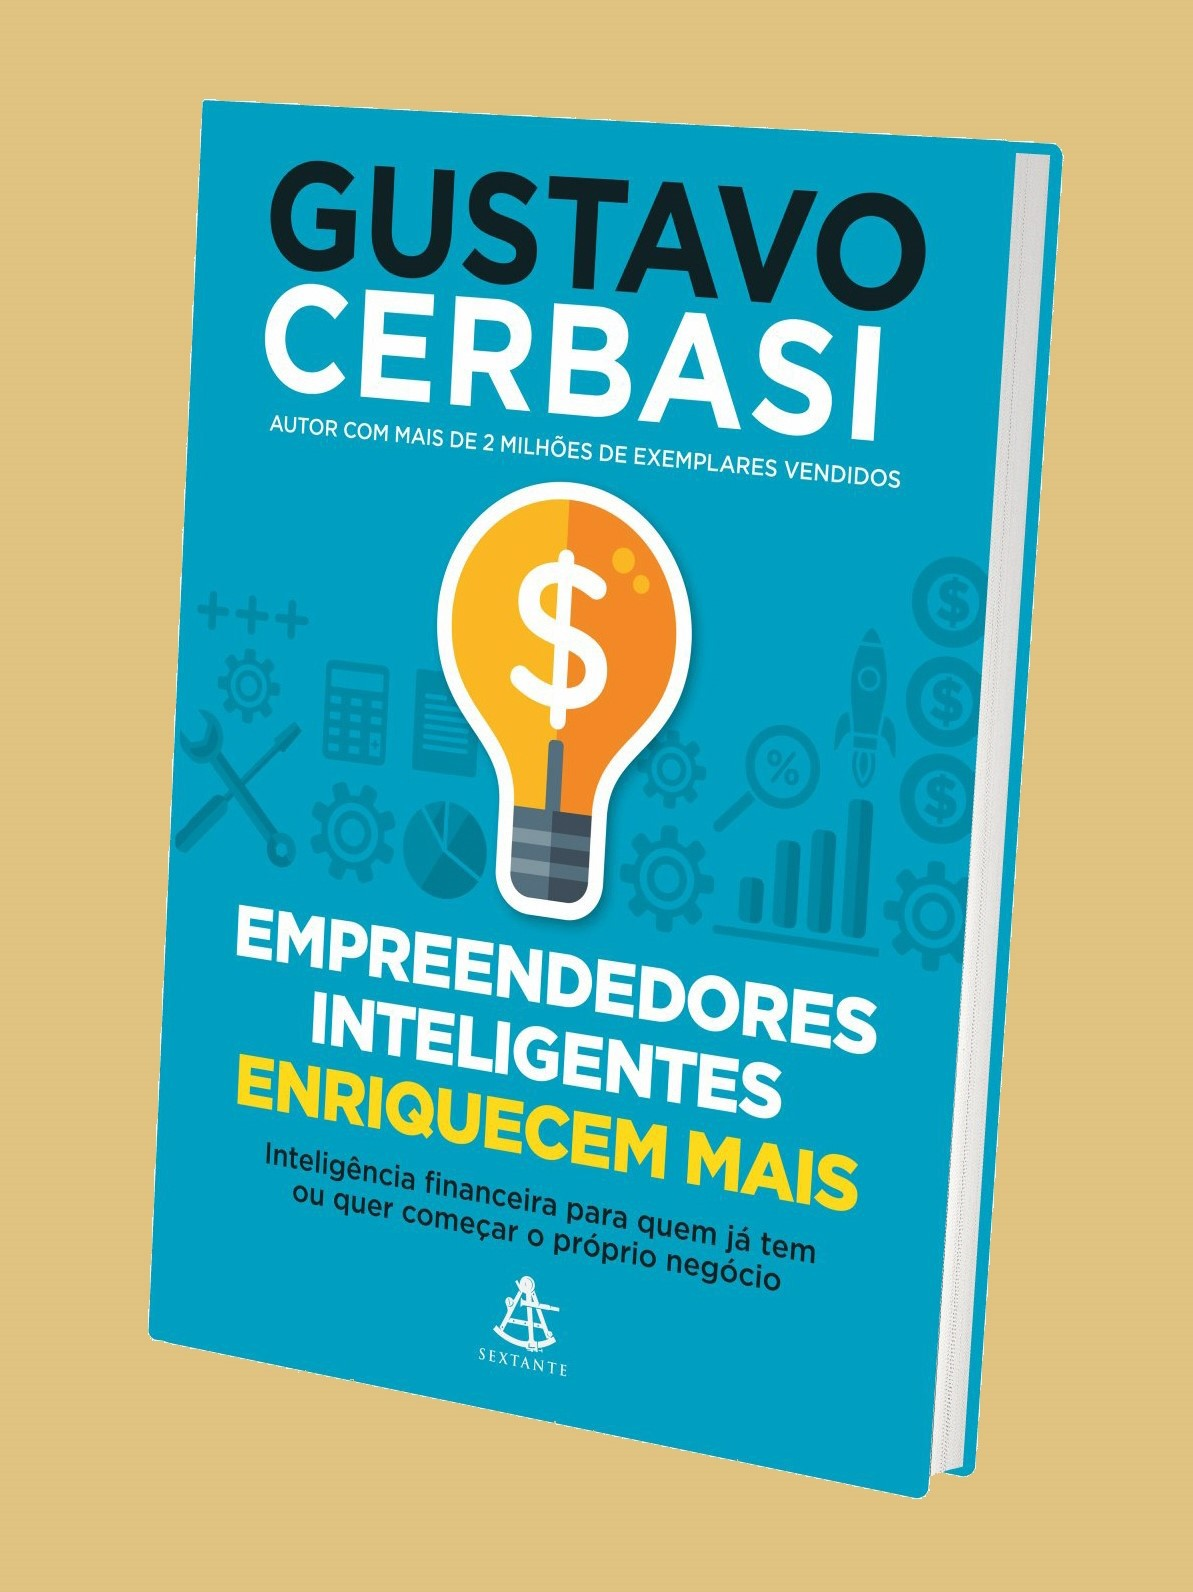 Empreendedores Inteligentes Enriquecem Mais - Gustavo Cerbasi